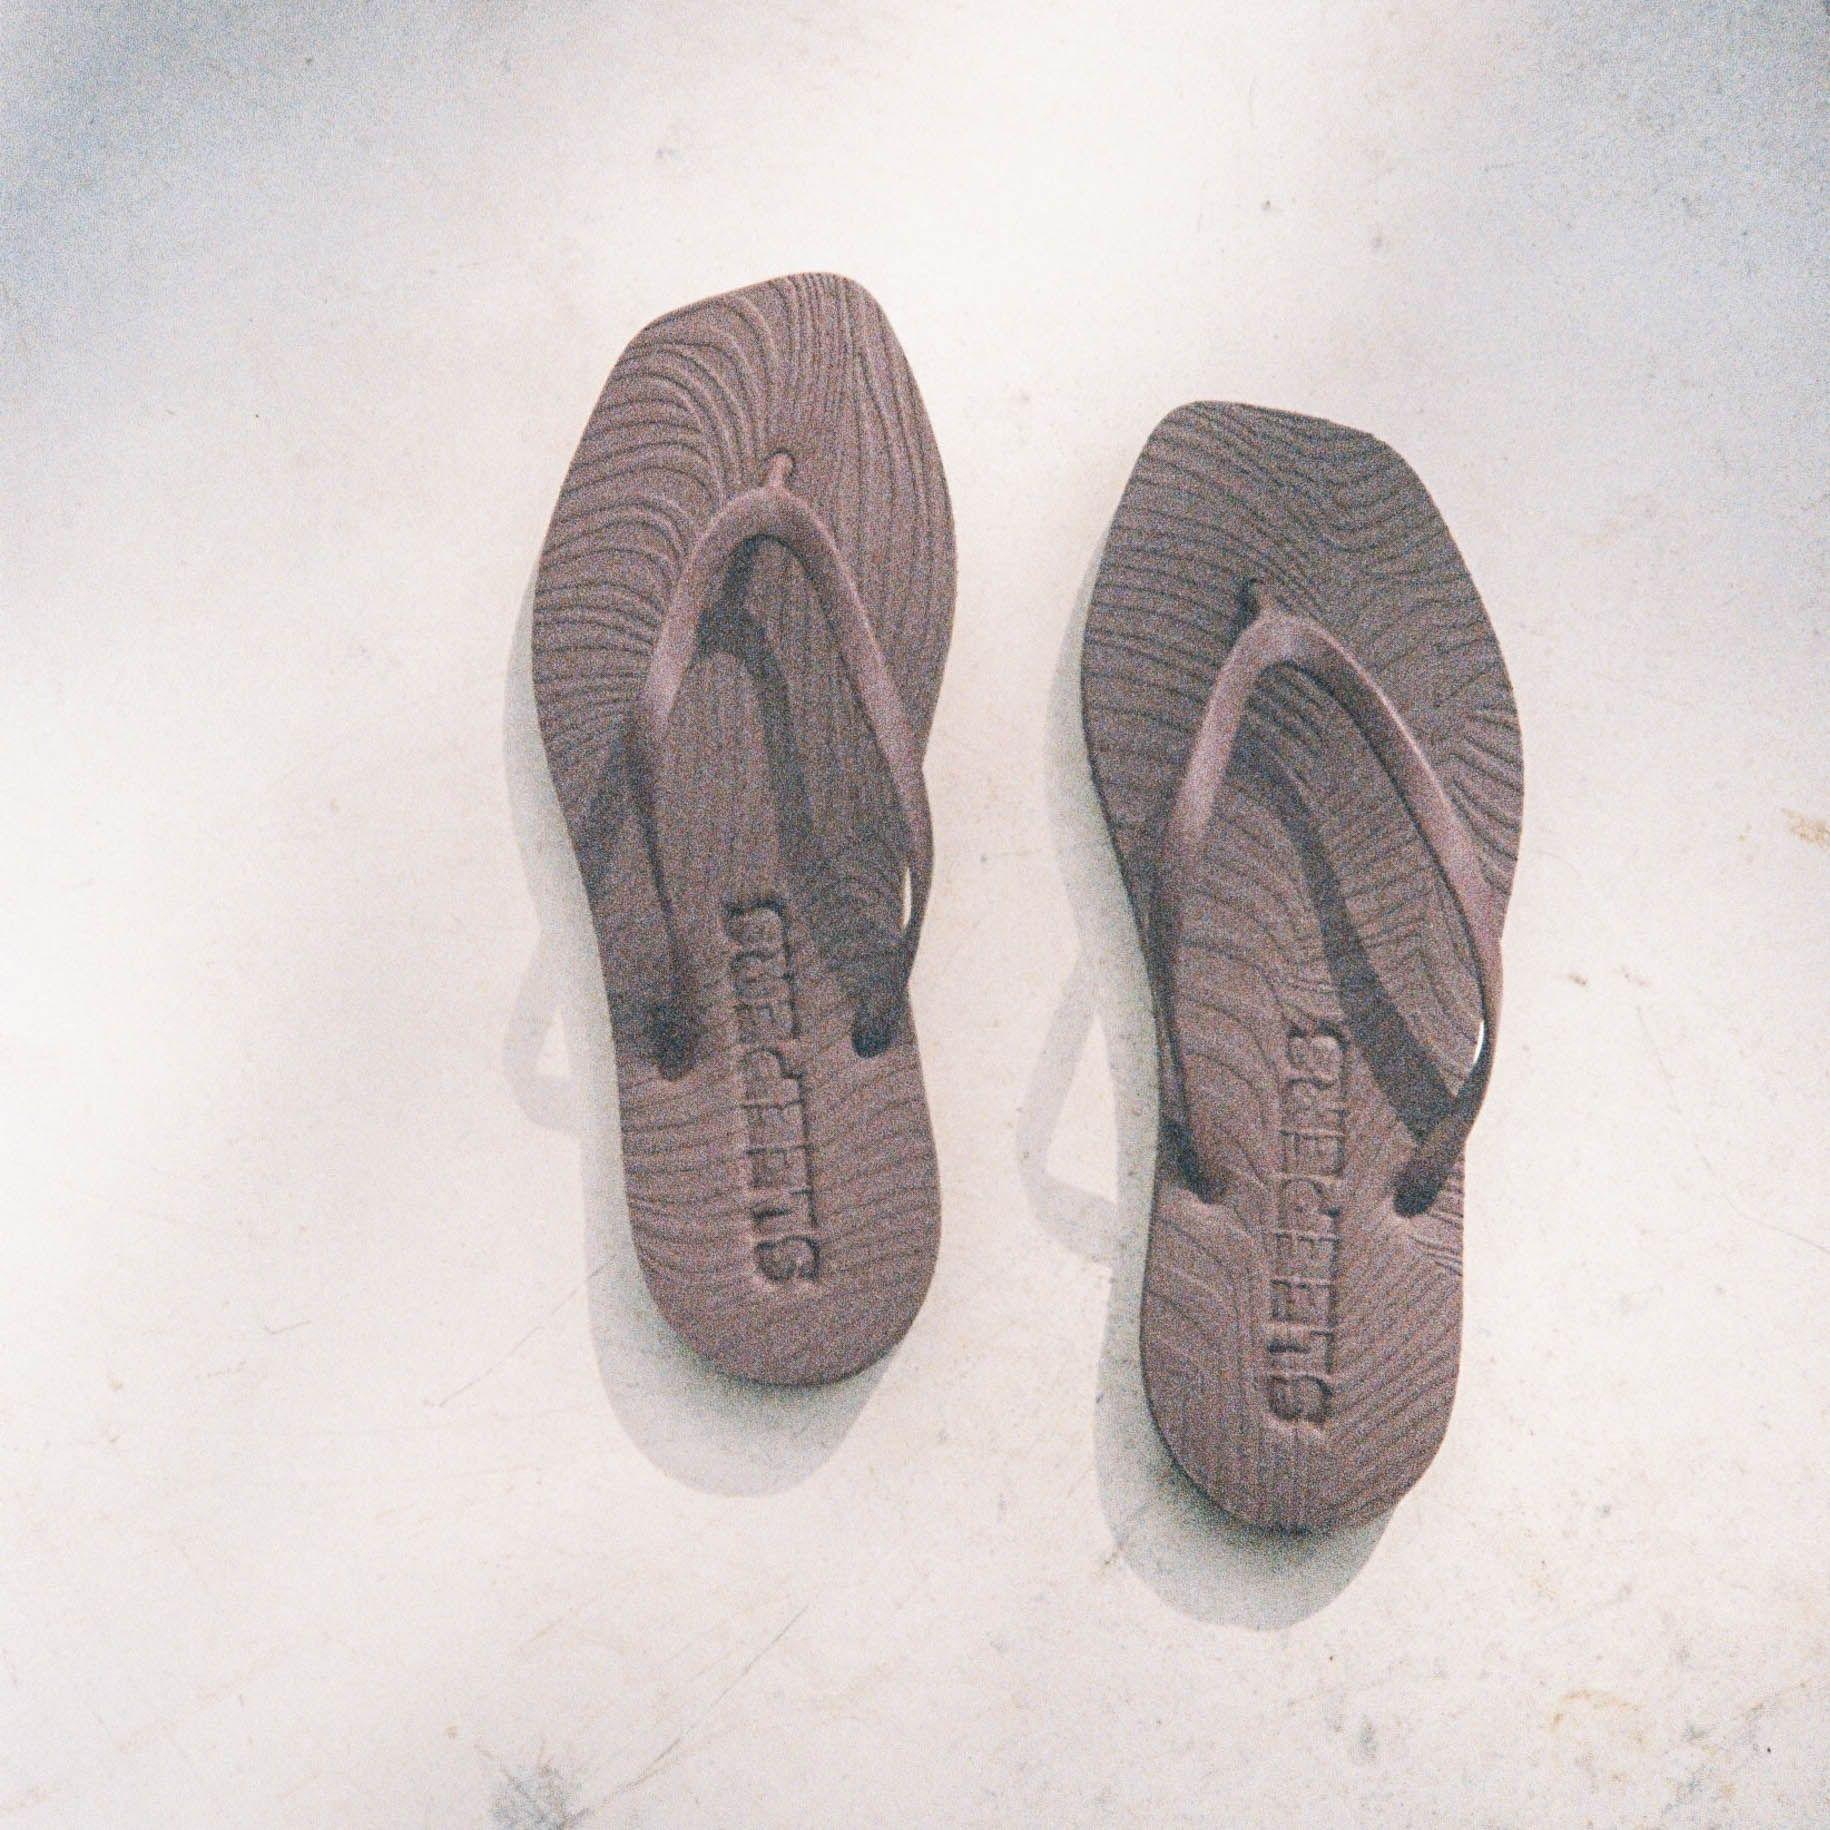 Brune Sleepers sandaler